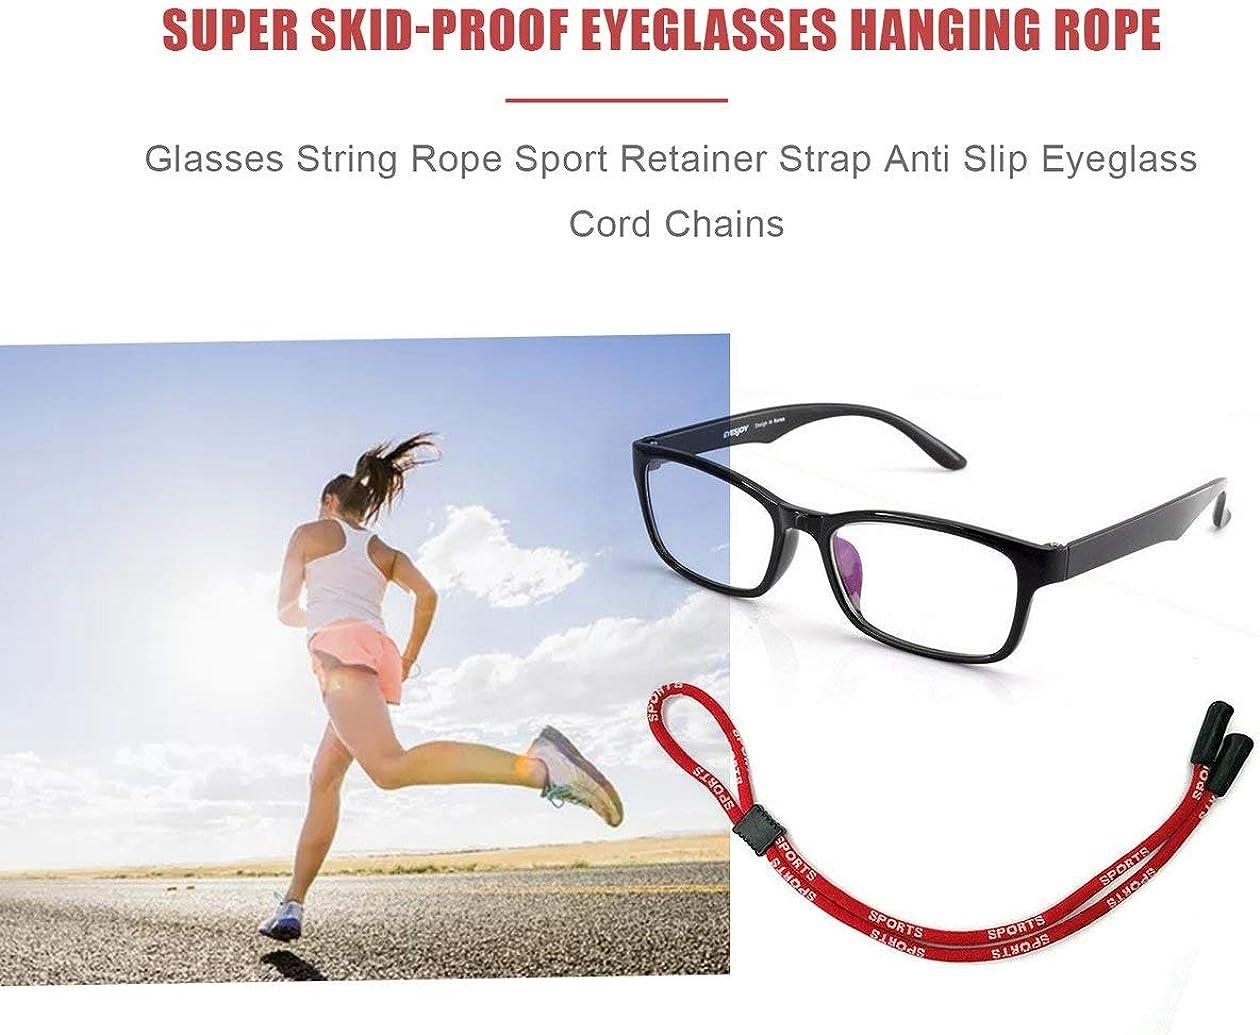 black BIYI Adjustable Glasses String Rope Sport Travel Neck Strap Retainer Strap Anti Slip Eyeglass Holder Cord Chains